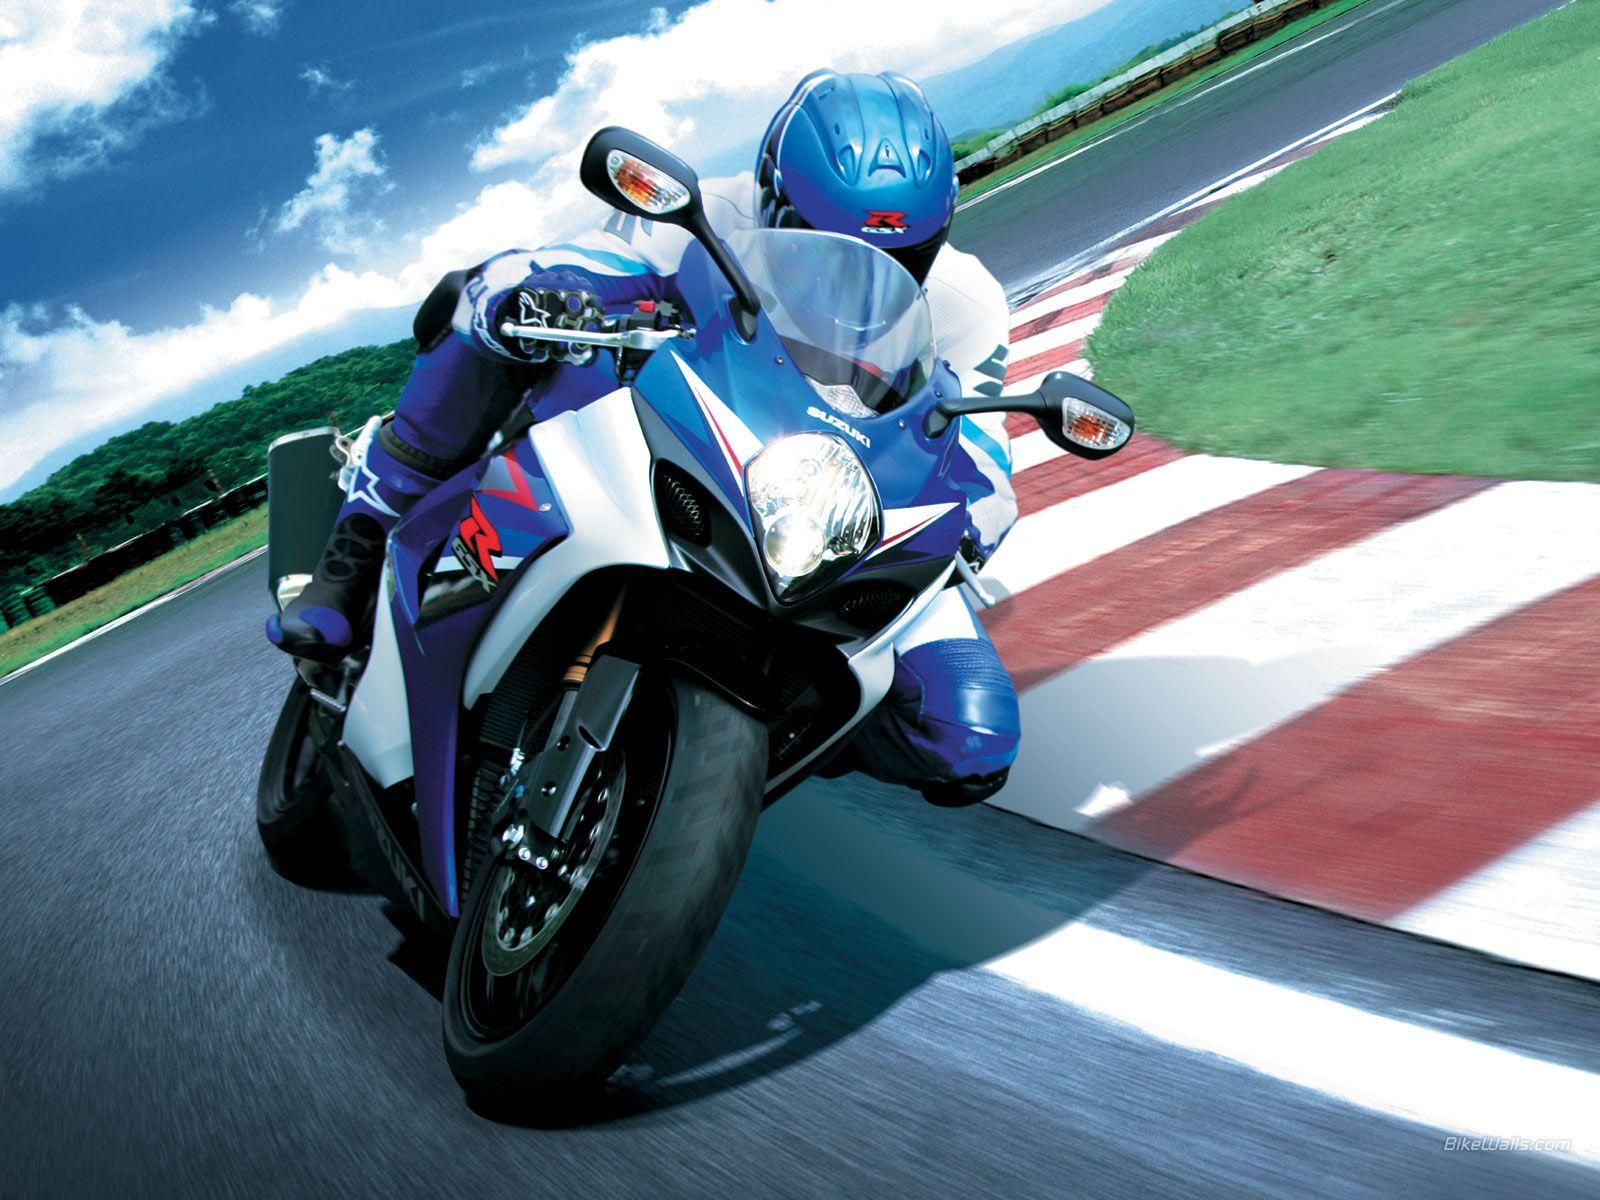 Suzuki Moto GP Wallpapers HD Wallpapers 1600x1200